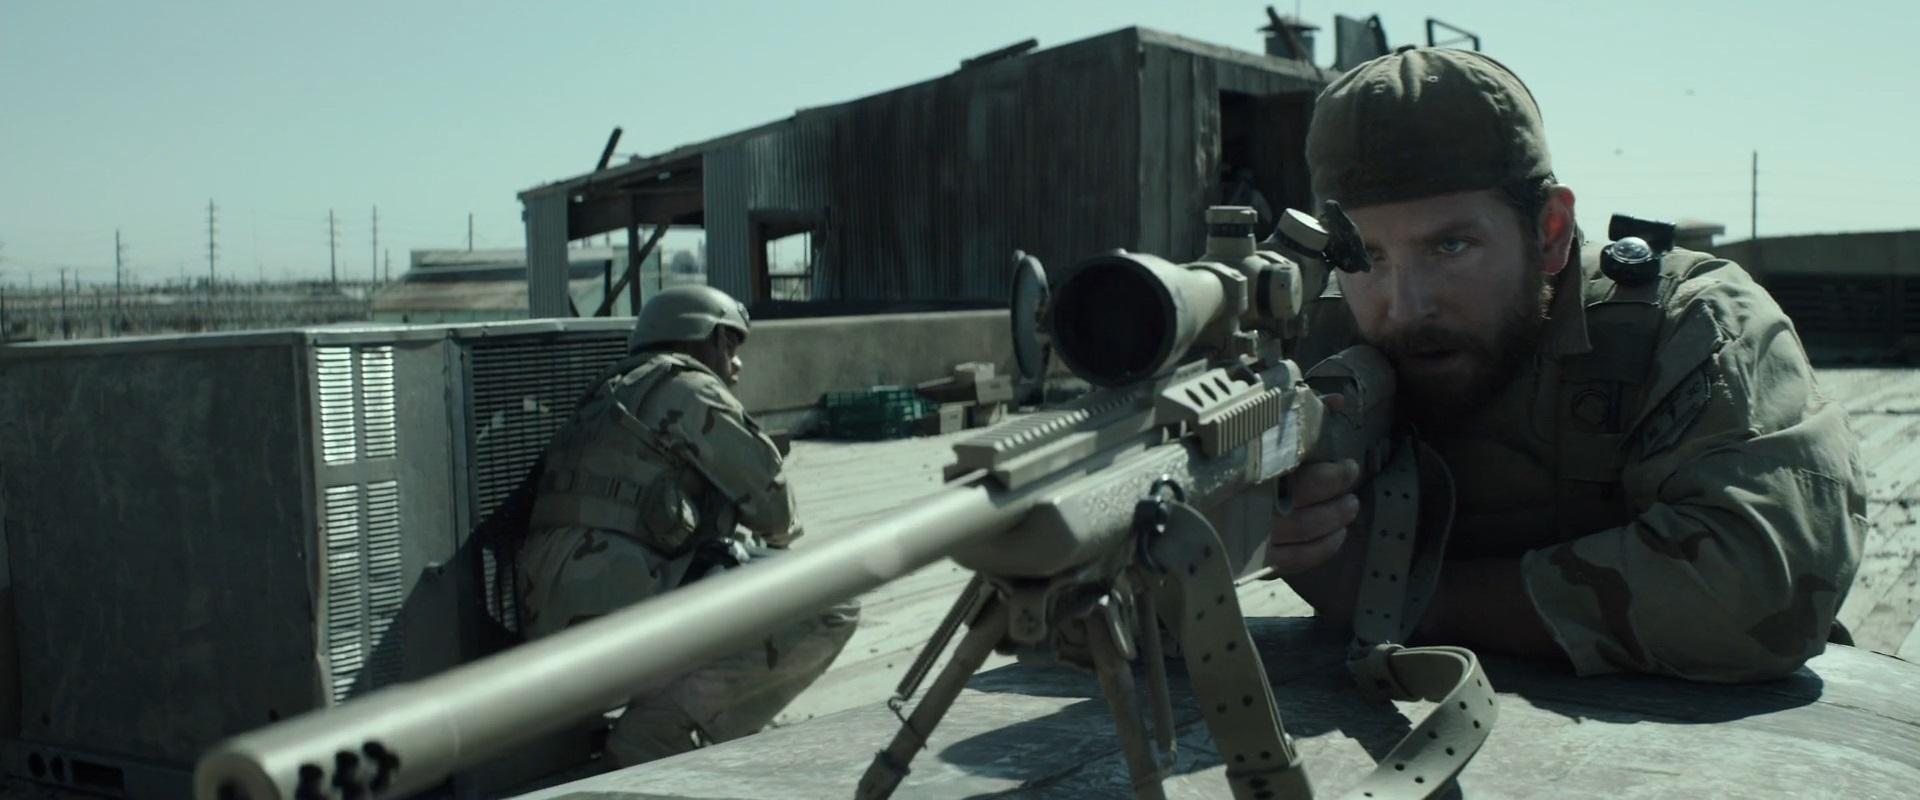 Leupold Mark 4 American Sniper